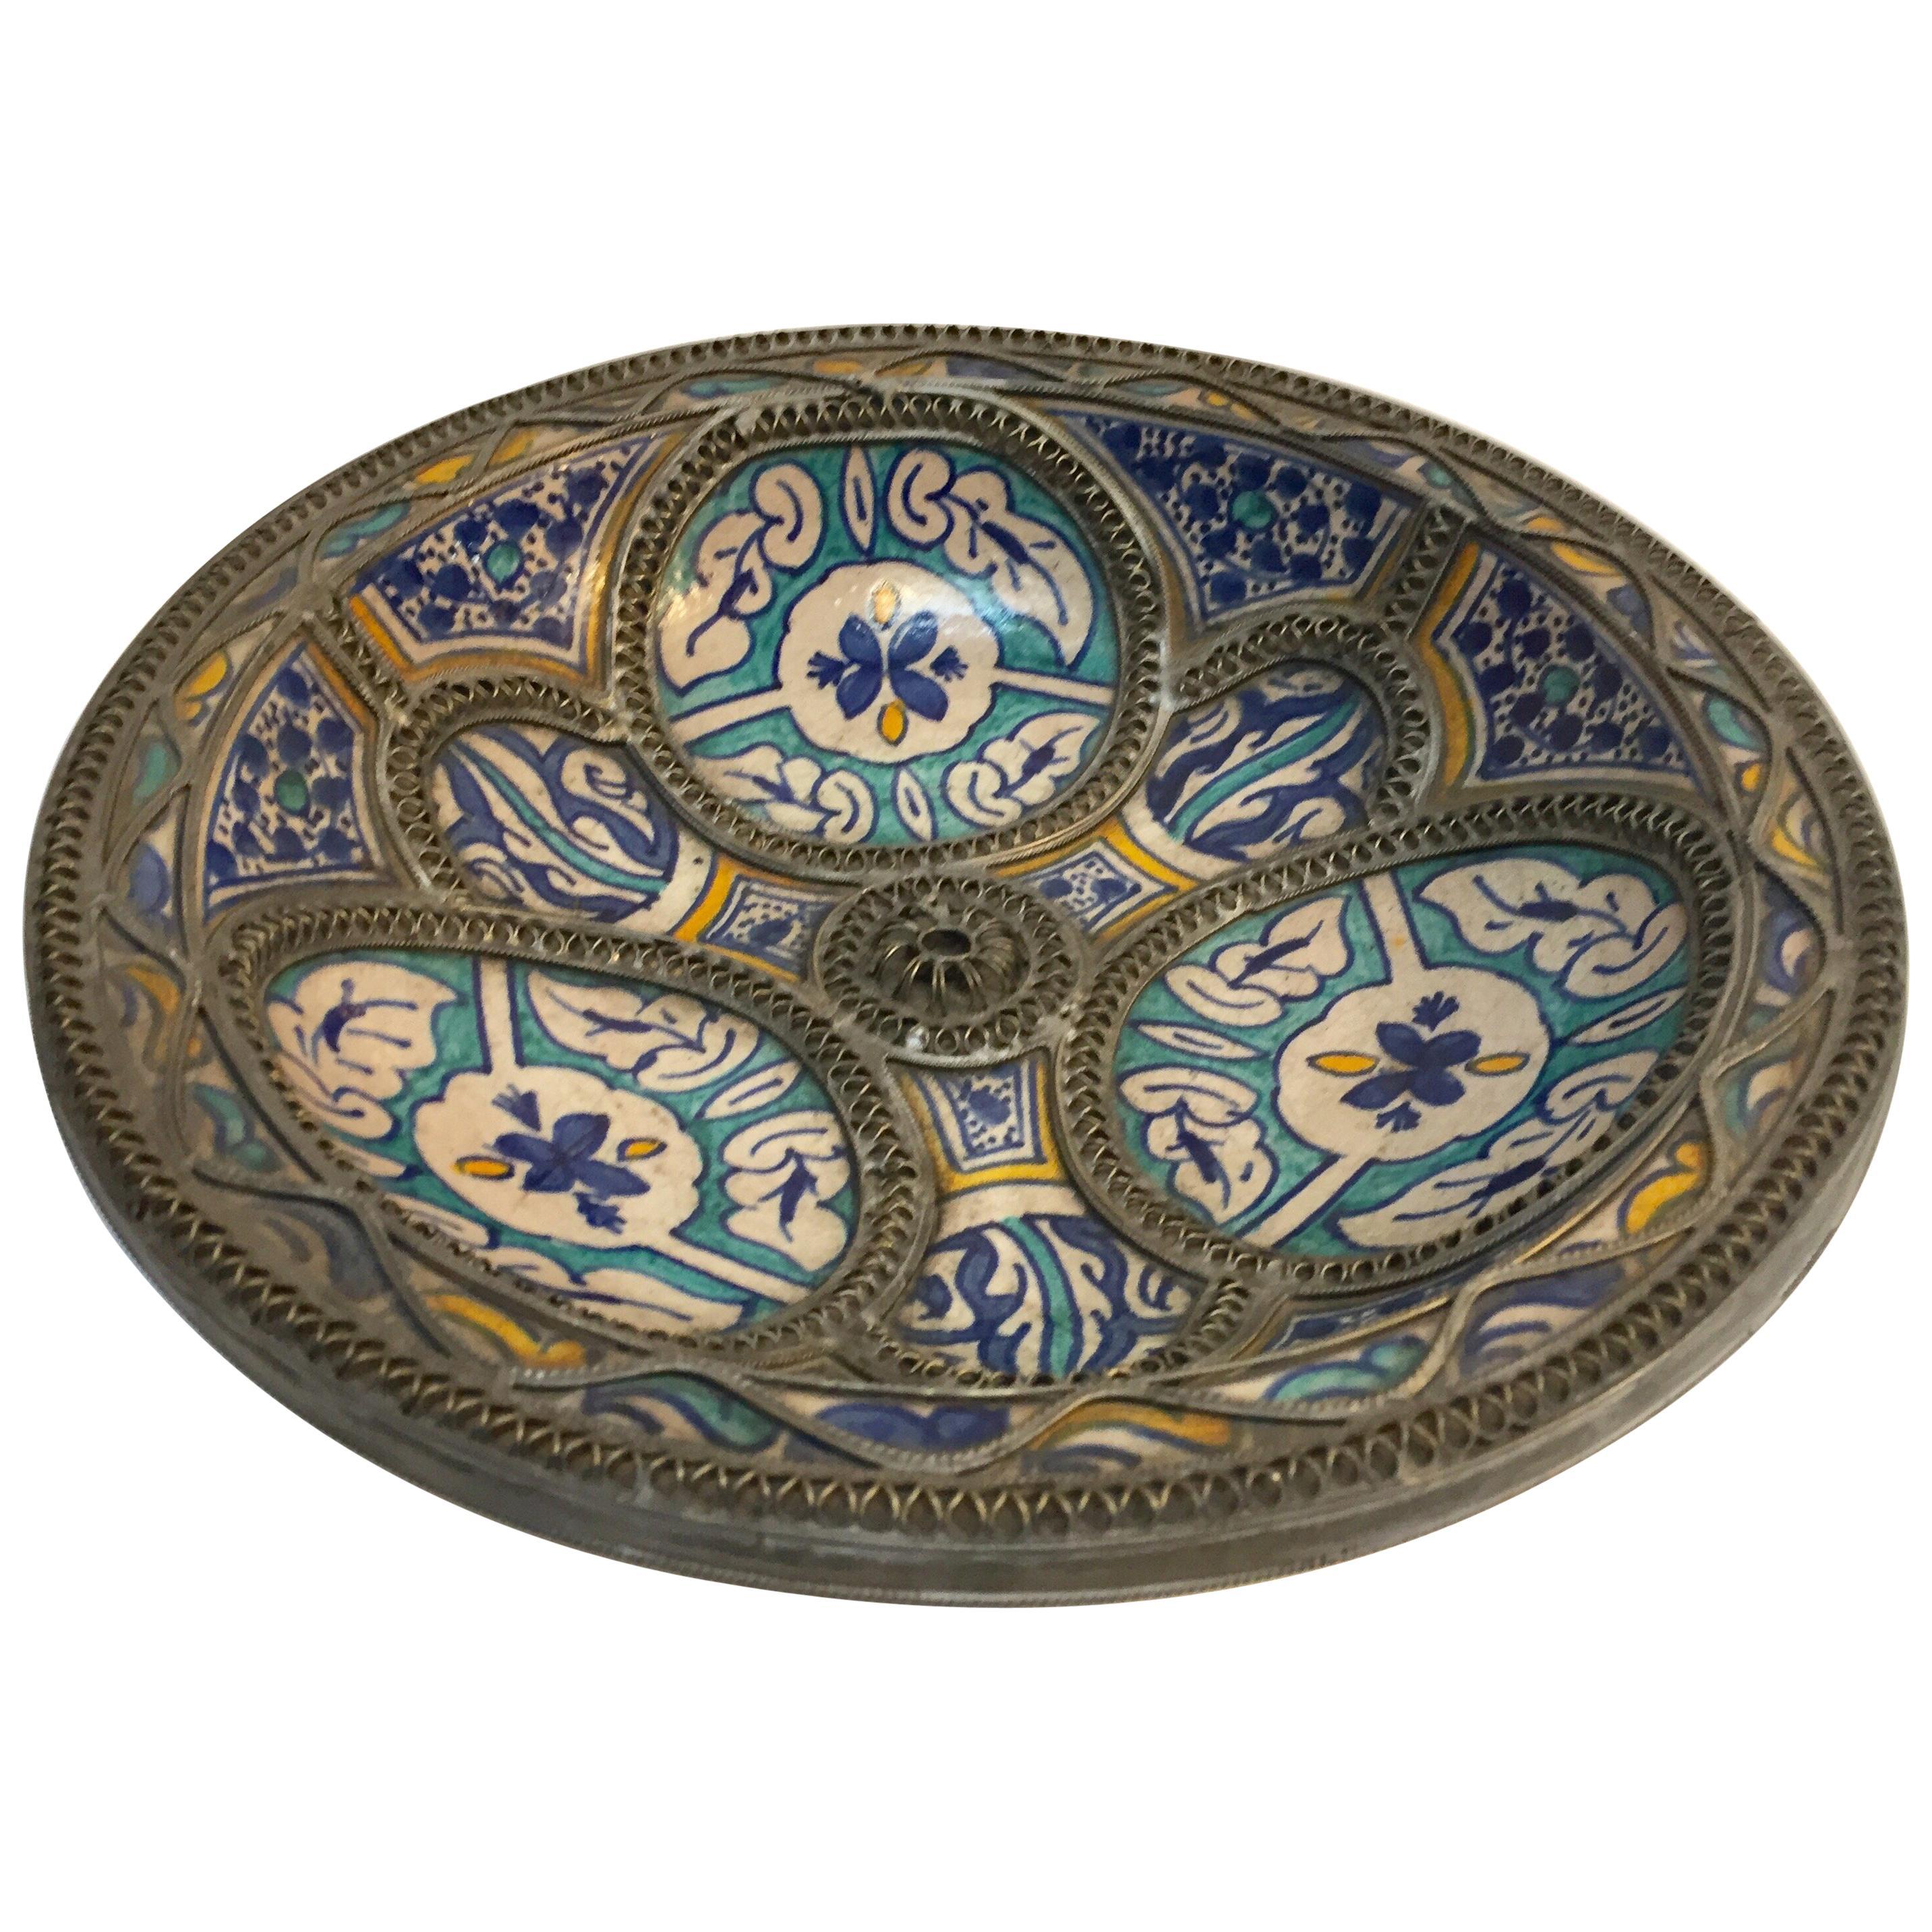 Moorish Ceramic Plate Adorned with Silver Filigree from Fez